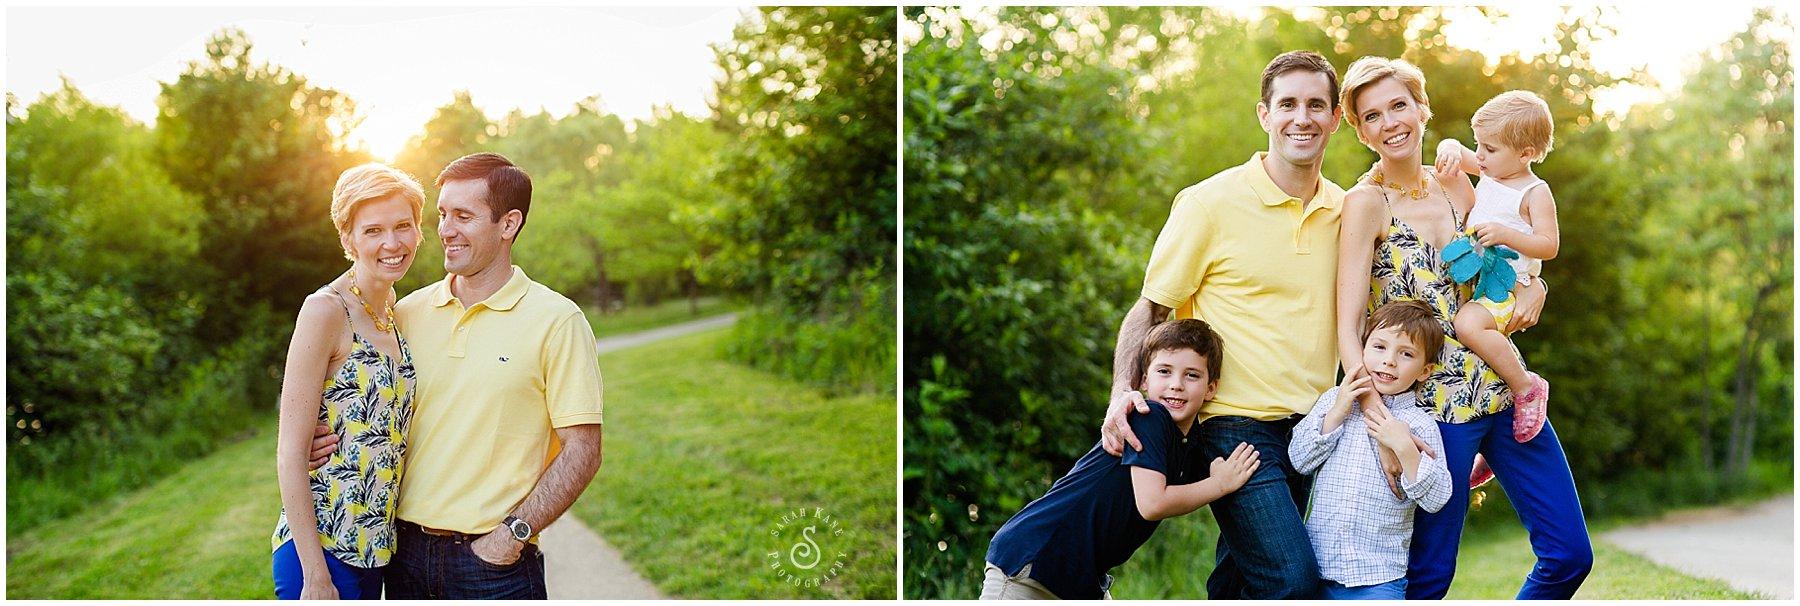 2_Lifestyle Family Portraits 67_ copy.jpg